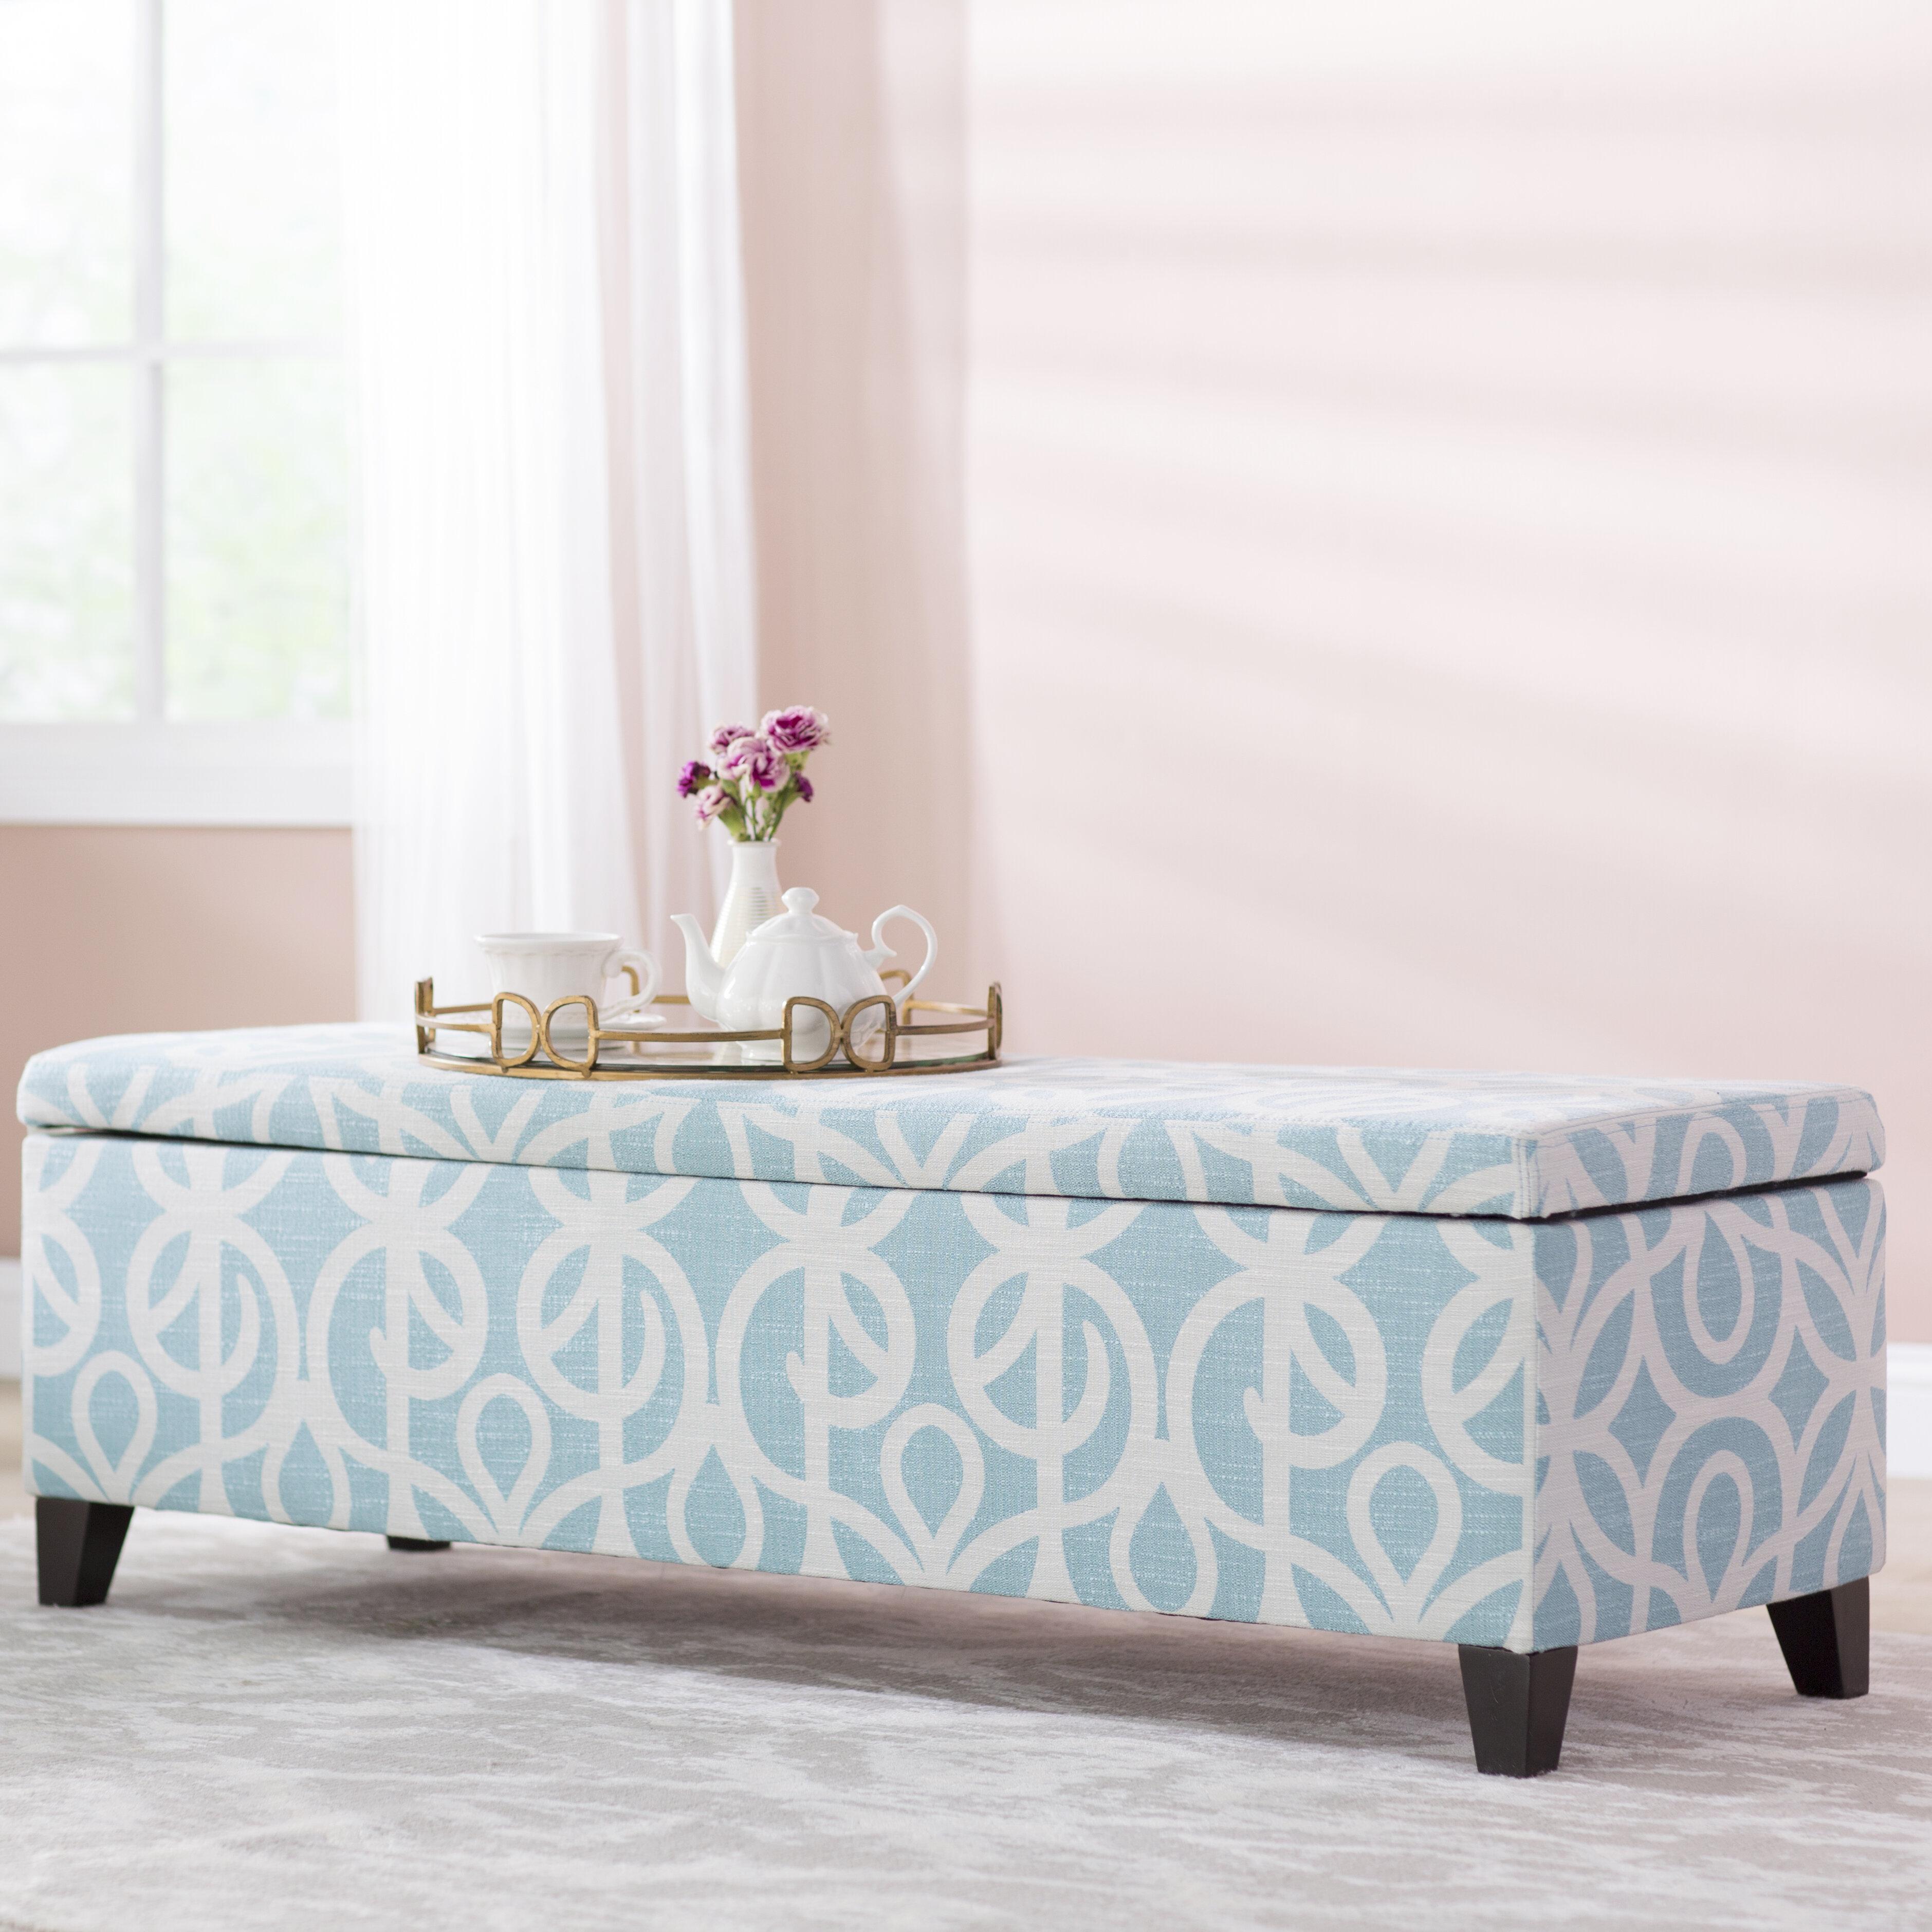 Charlton Home Adair Upholstered Storage Bench & Reviews | Wayfair